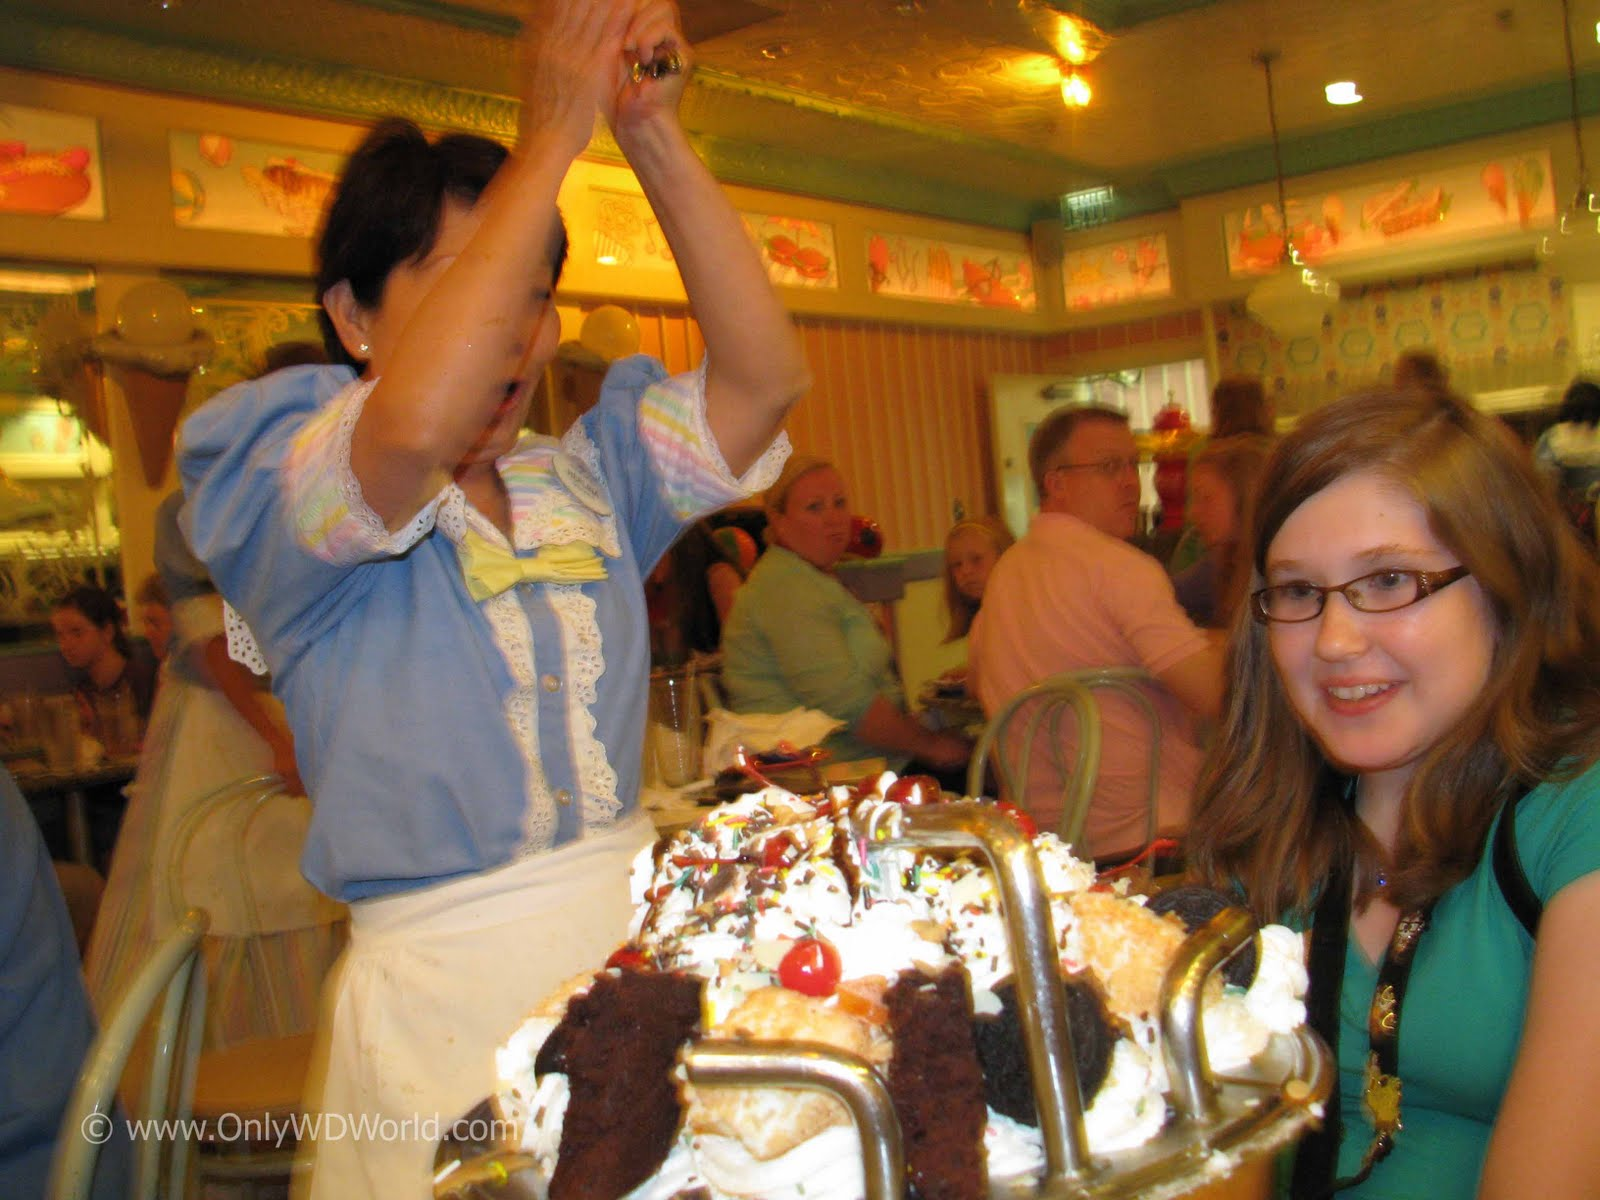 Beaches & Cream Kitchen Sink The Ultimate Disney World Family